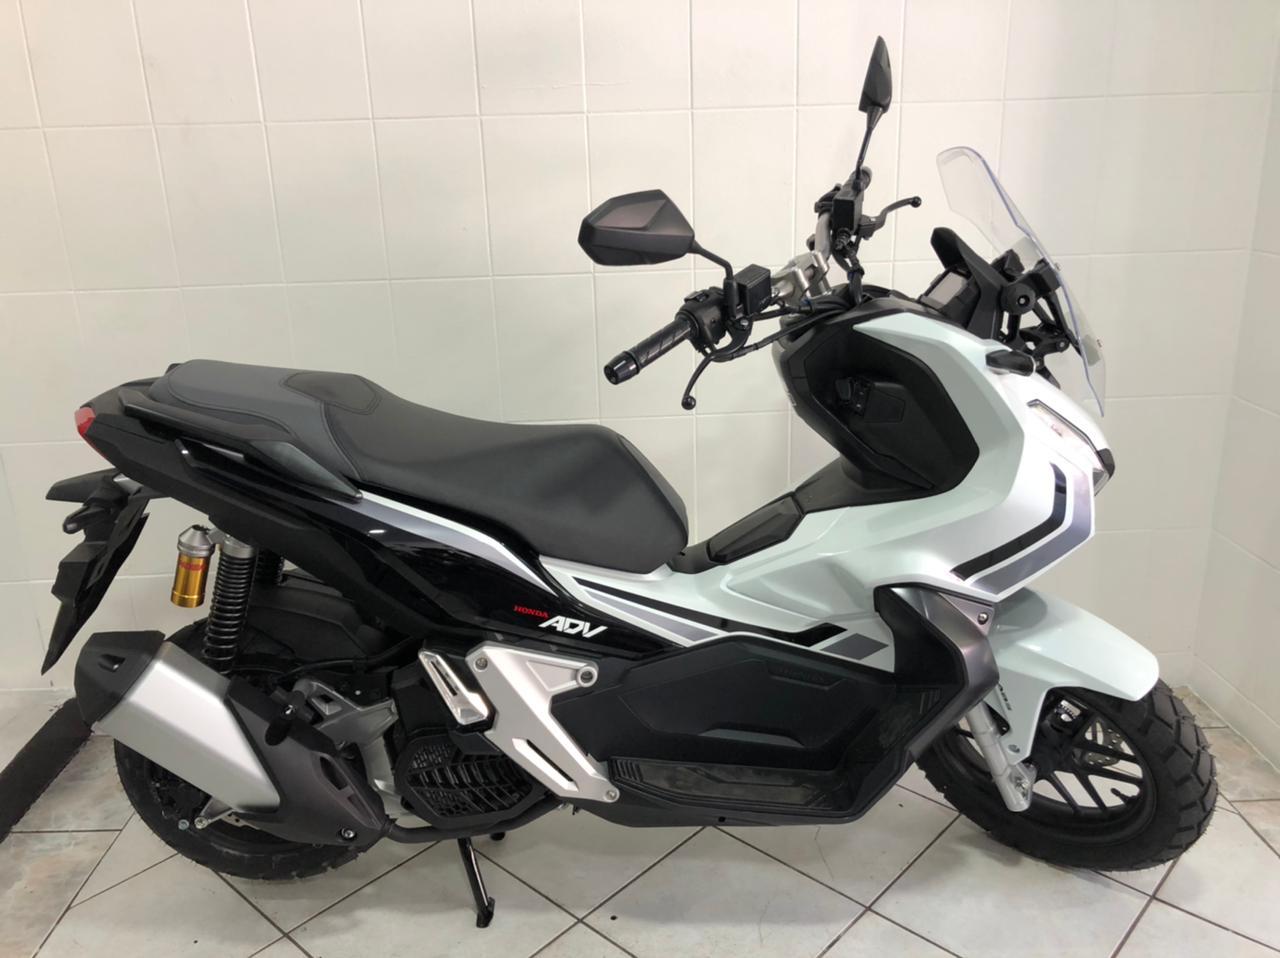 Honda X-ADV 2021 la prova del maxi scooter enduro Honda